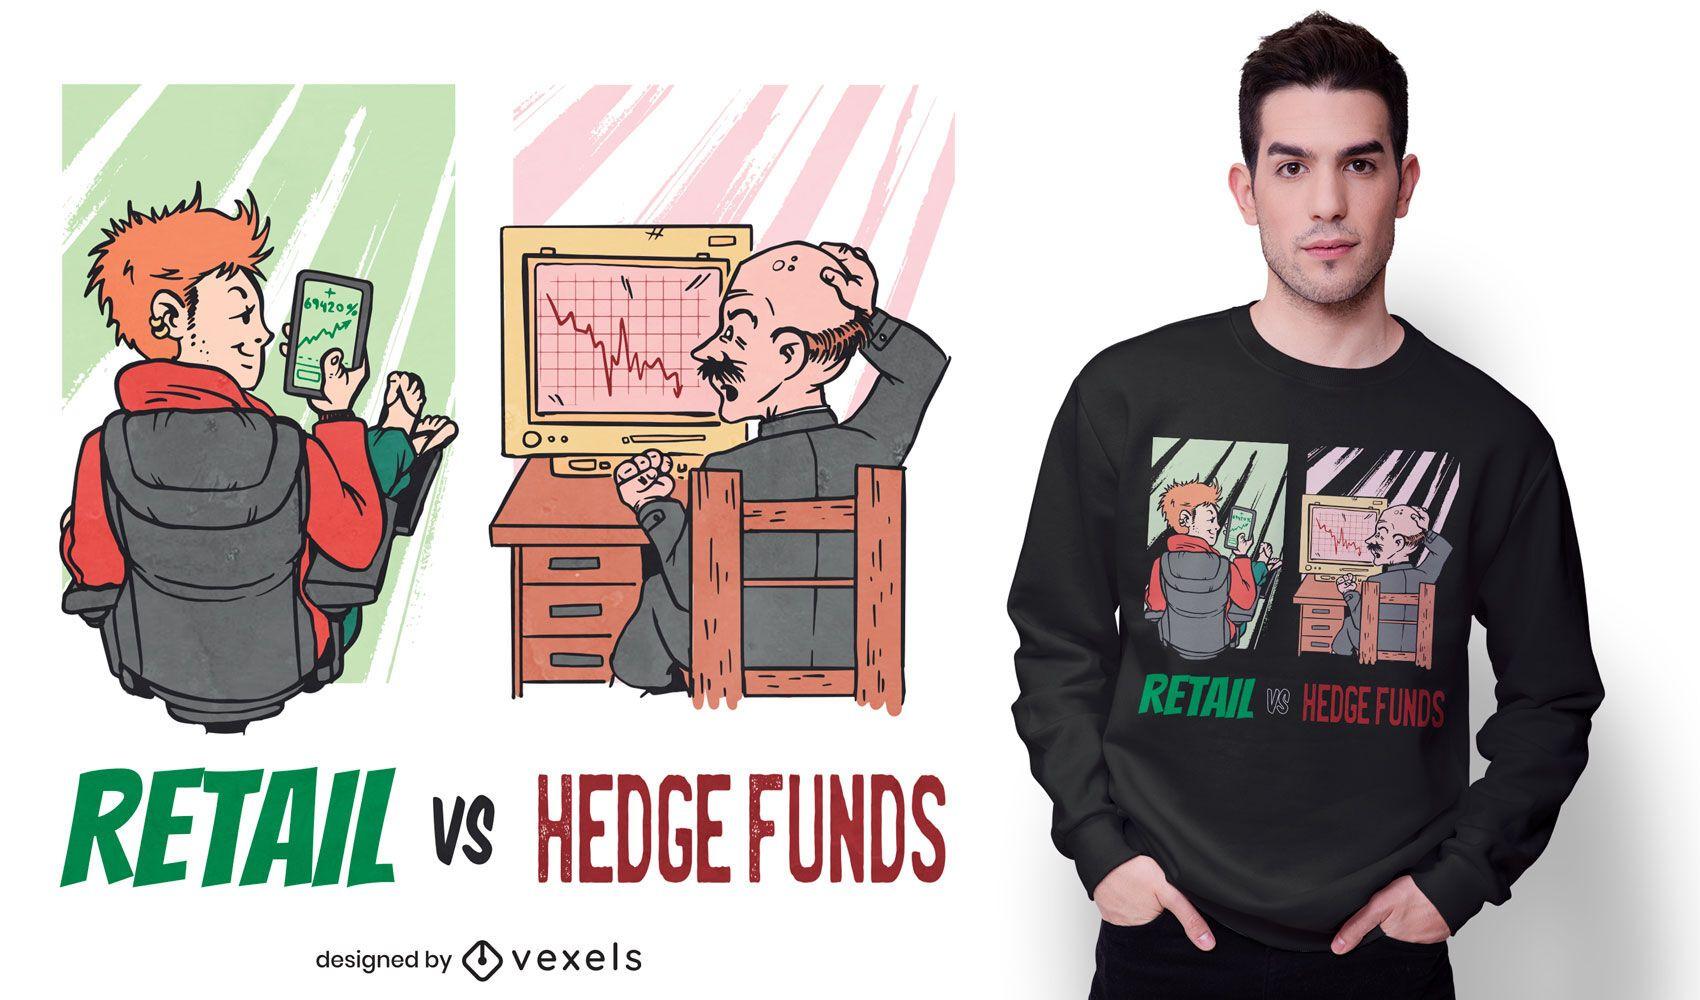 Design de camisetas de varejo x fundos de hedge